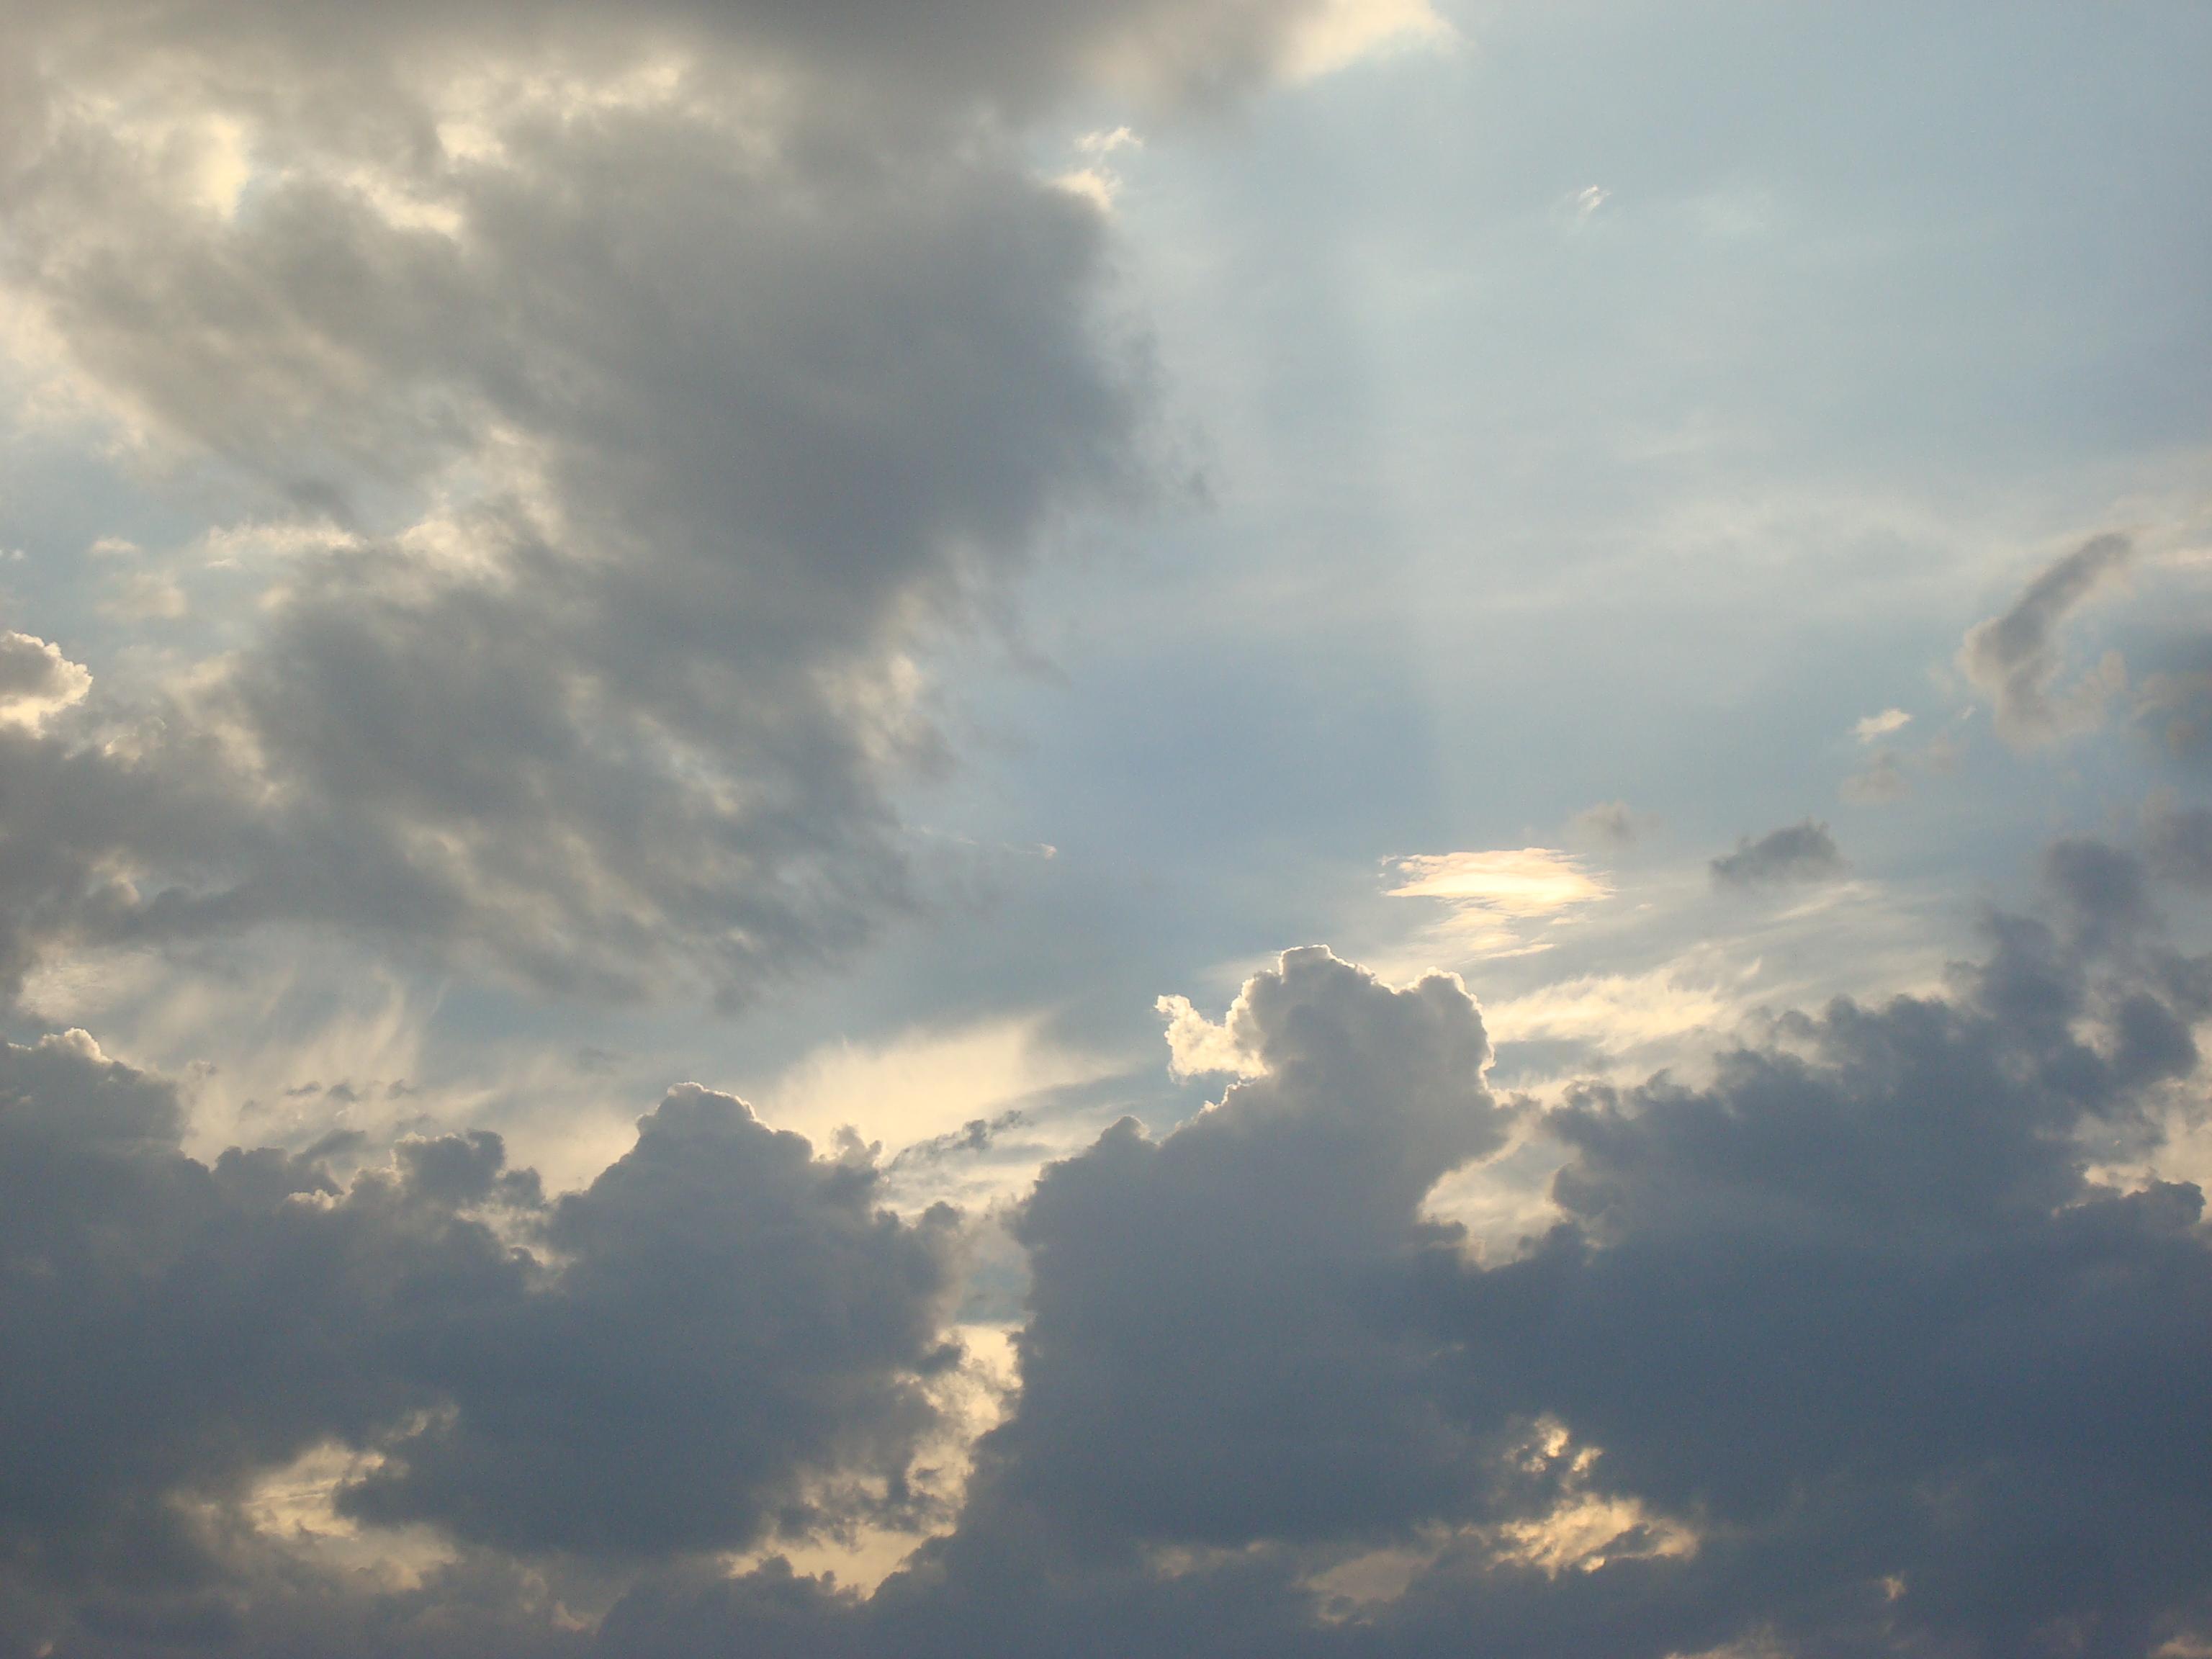 Clouds hiding the sun, Beautiful, Blue, Clouds, Cloudy, HQ Photo